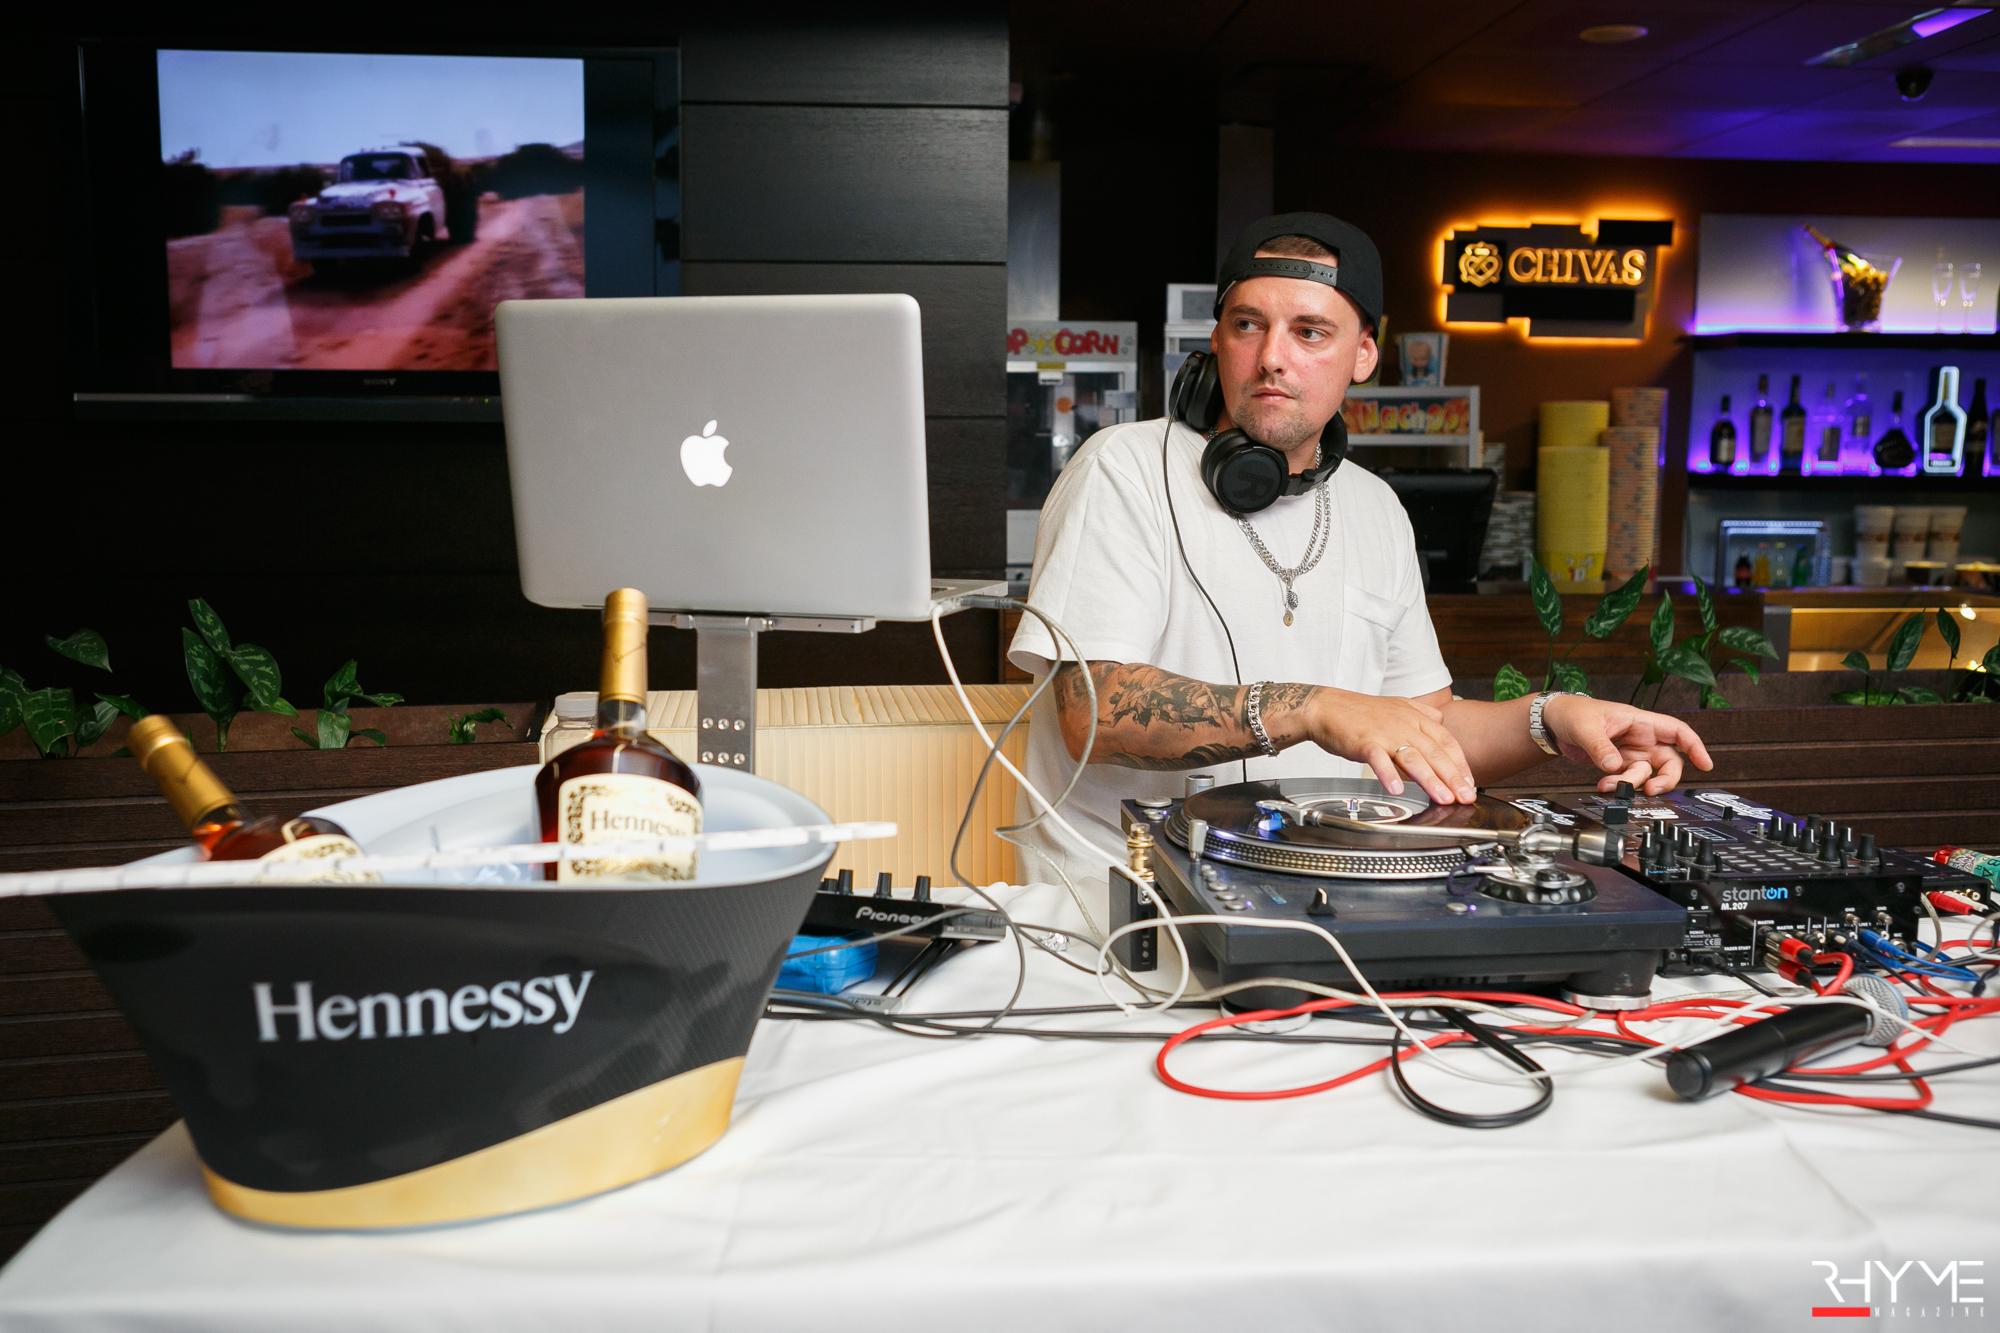 DJ Nik-One